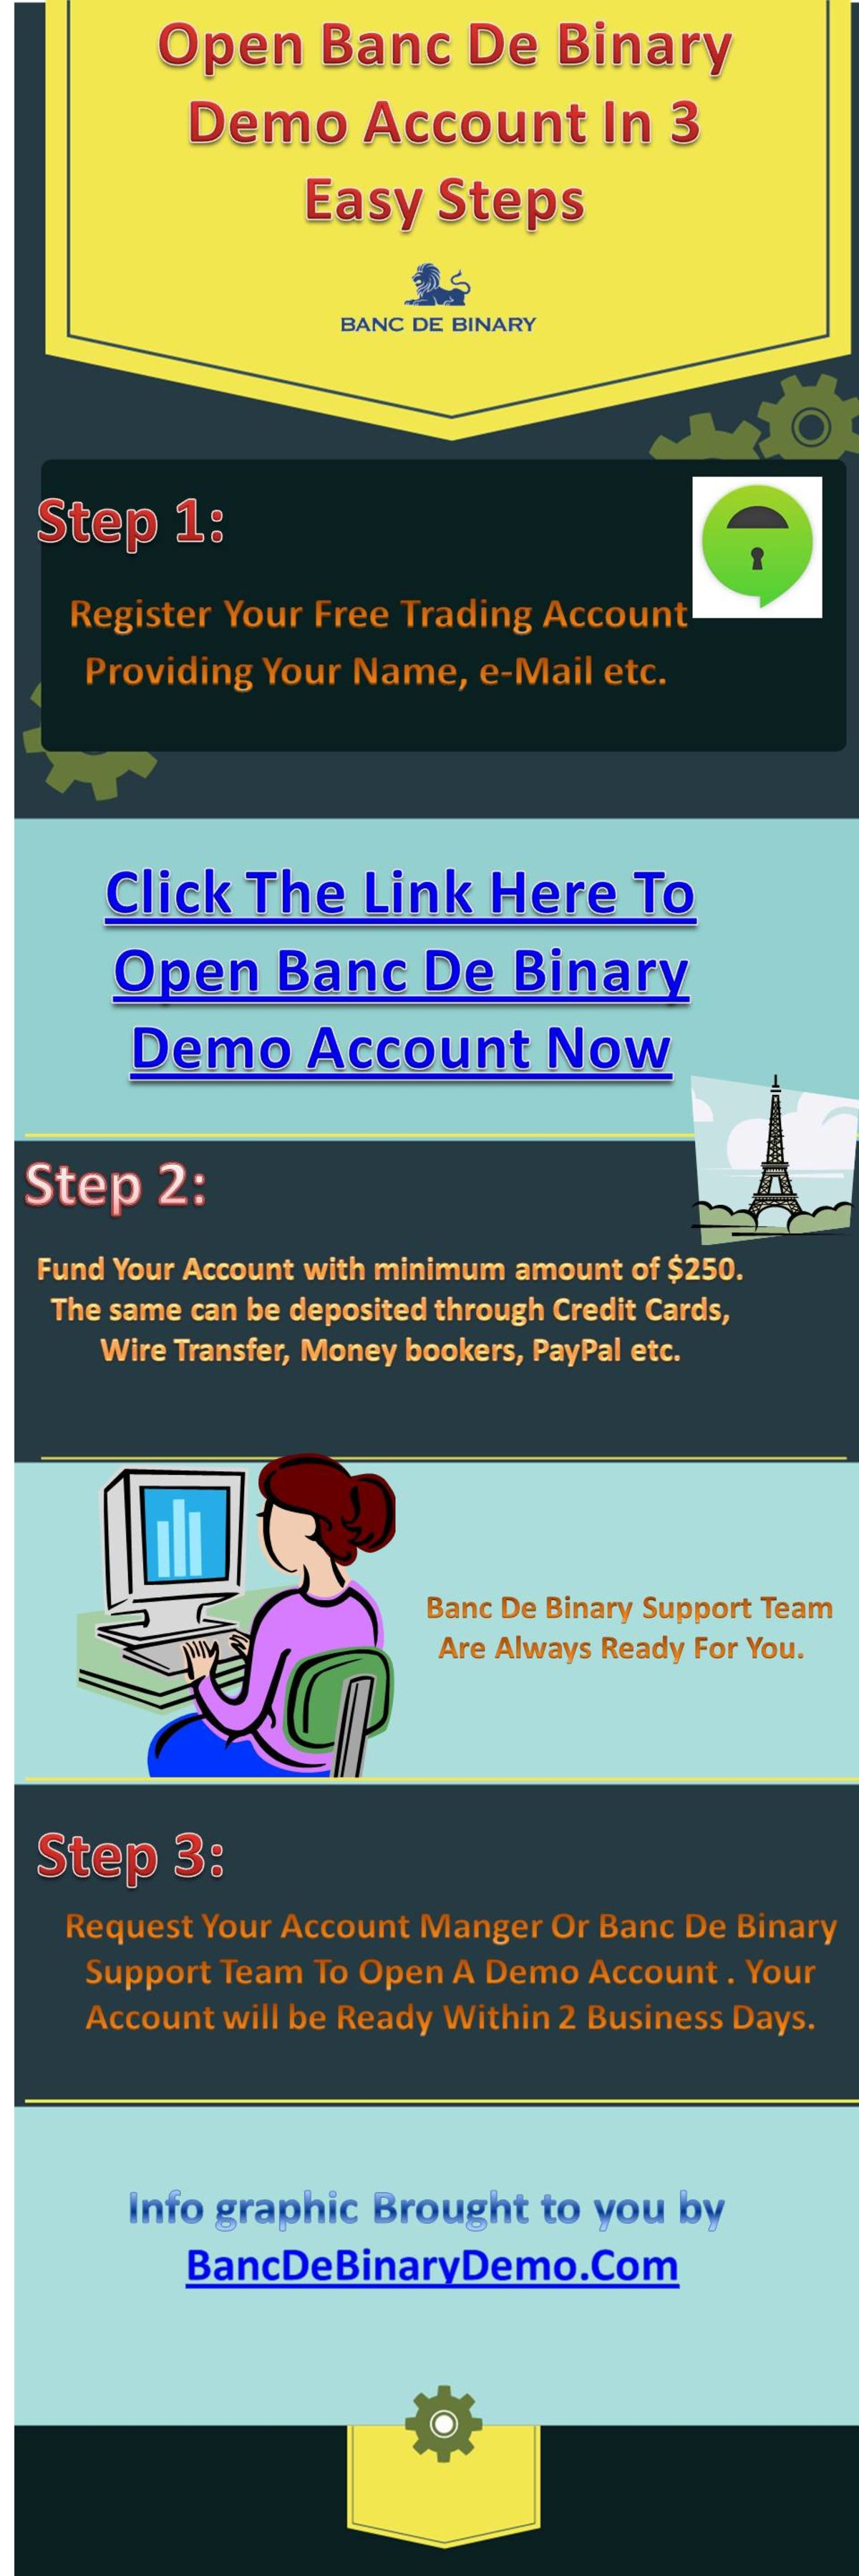 Banc de binary demo account